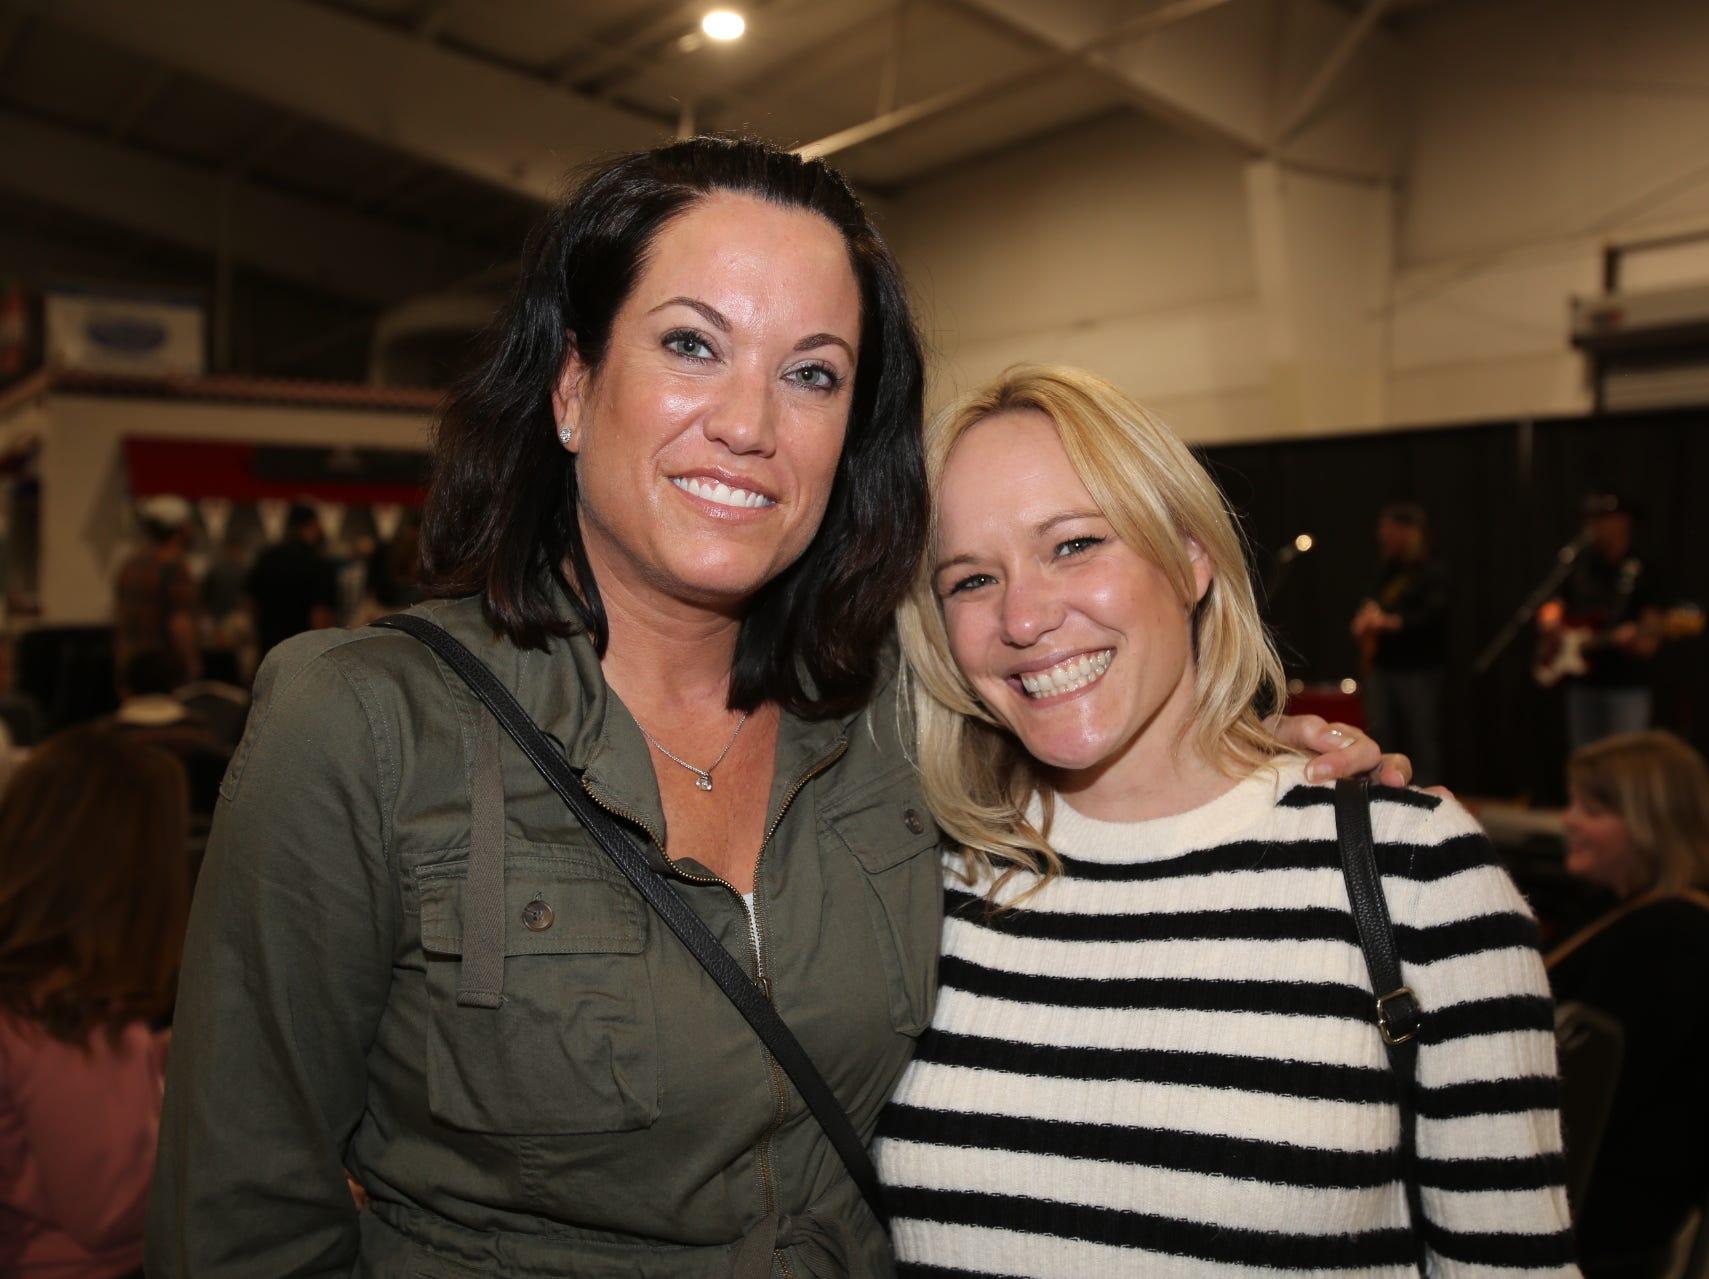 Shay and Laura Baker